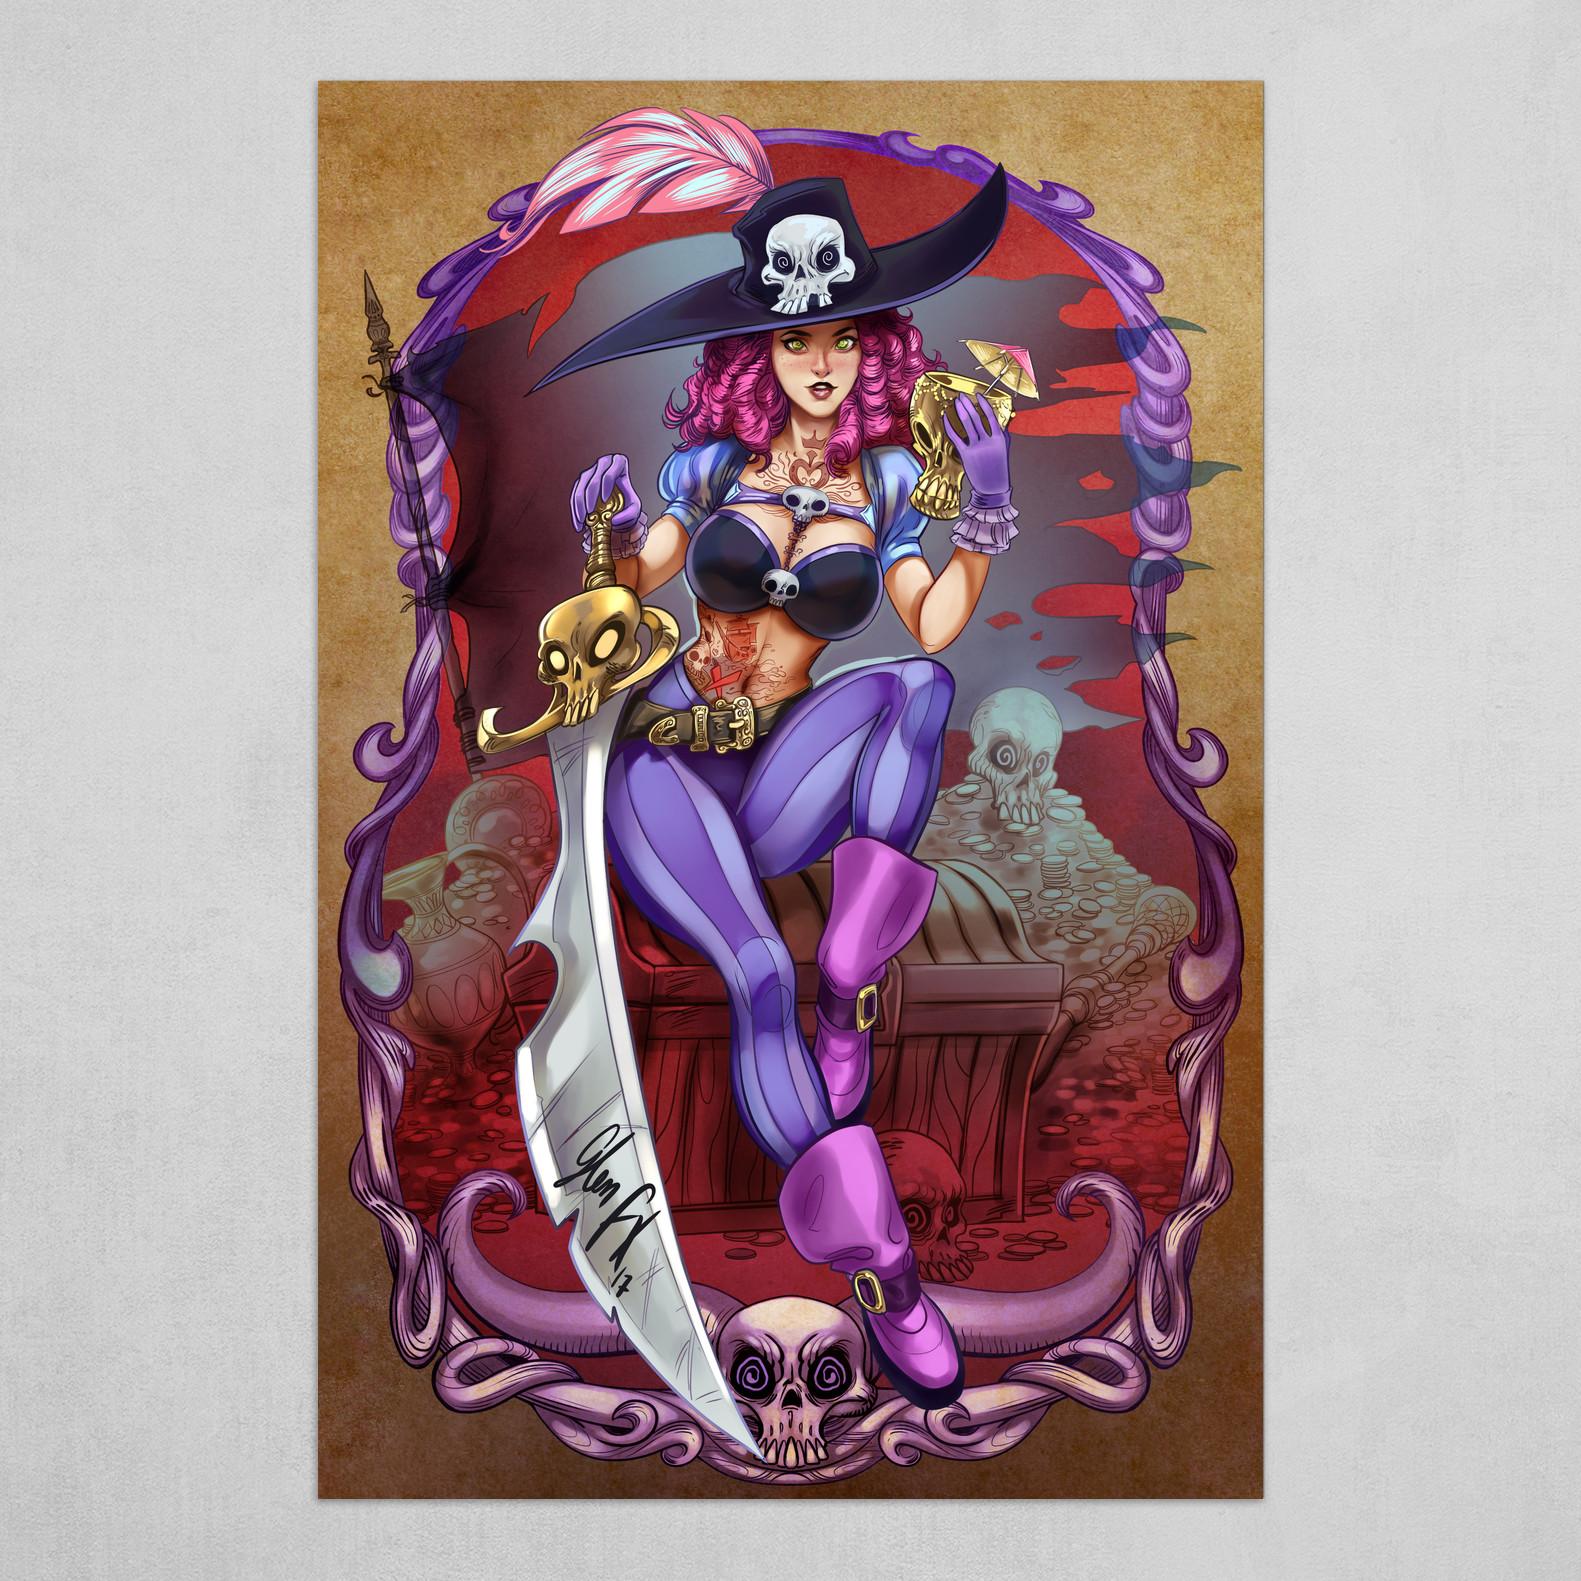 Wicked Witch - Pirate Jane